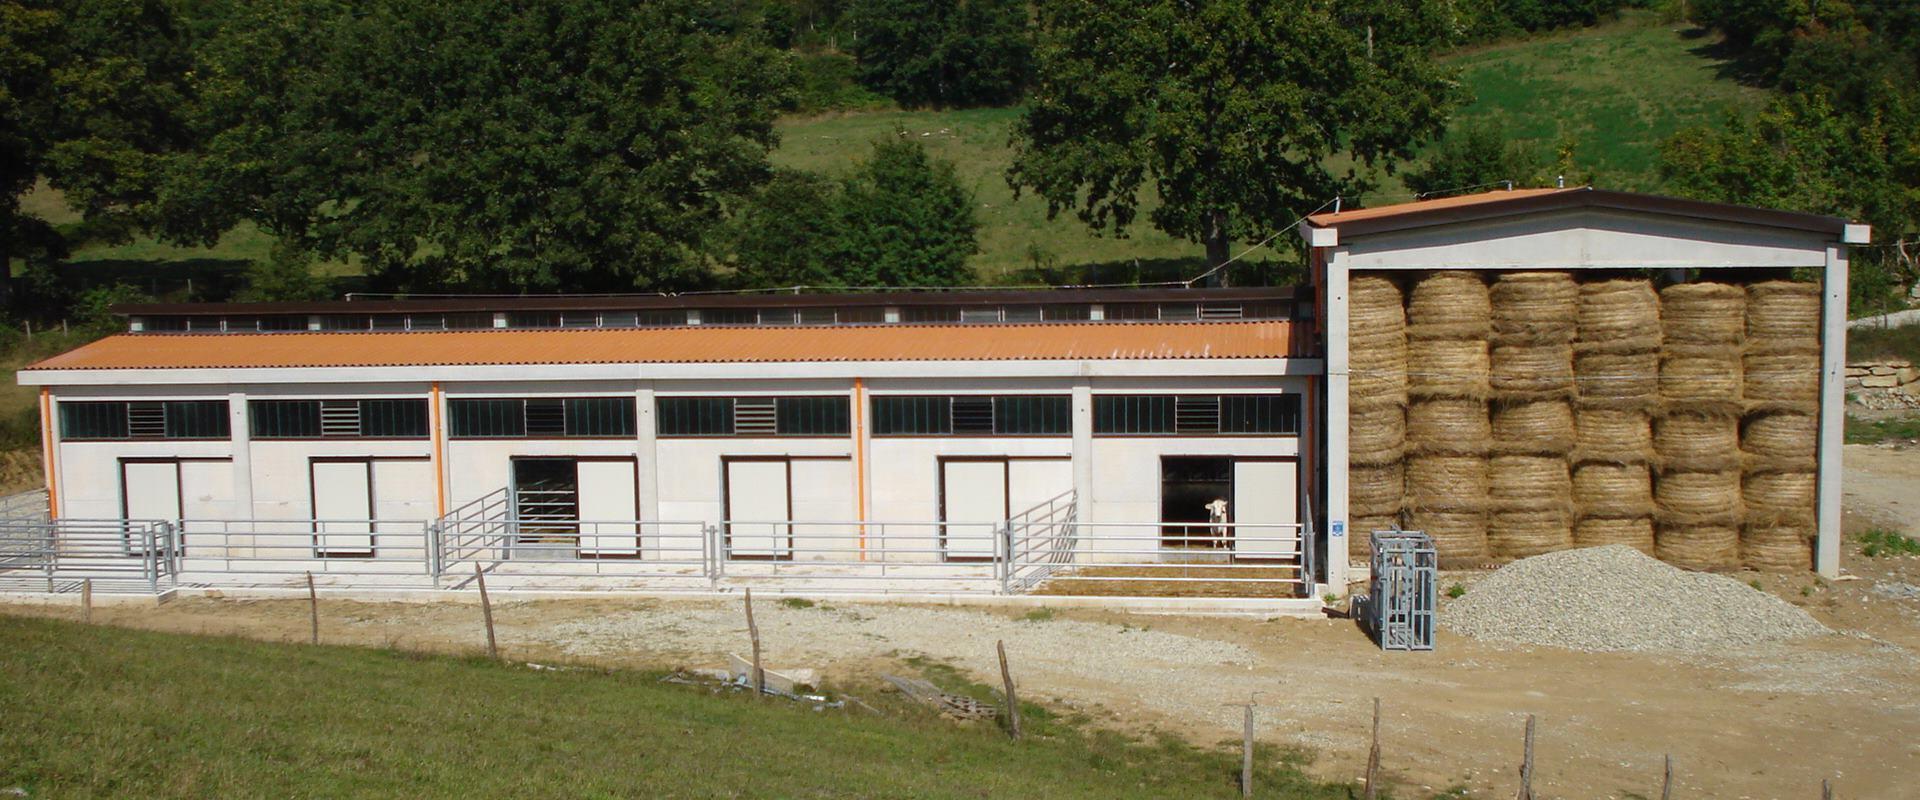 Impianti-Zootecnici2 Home